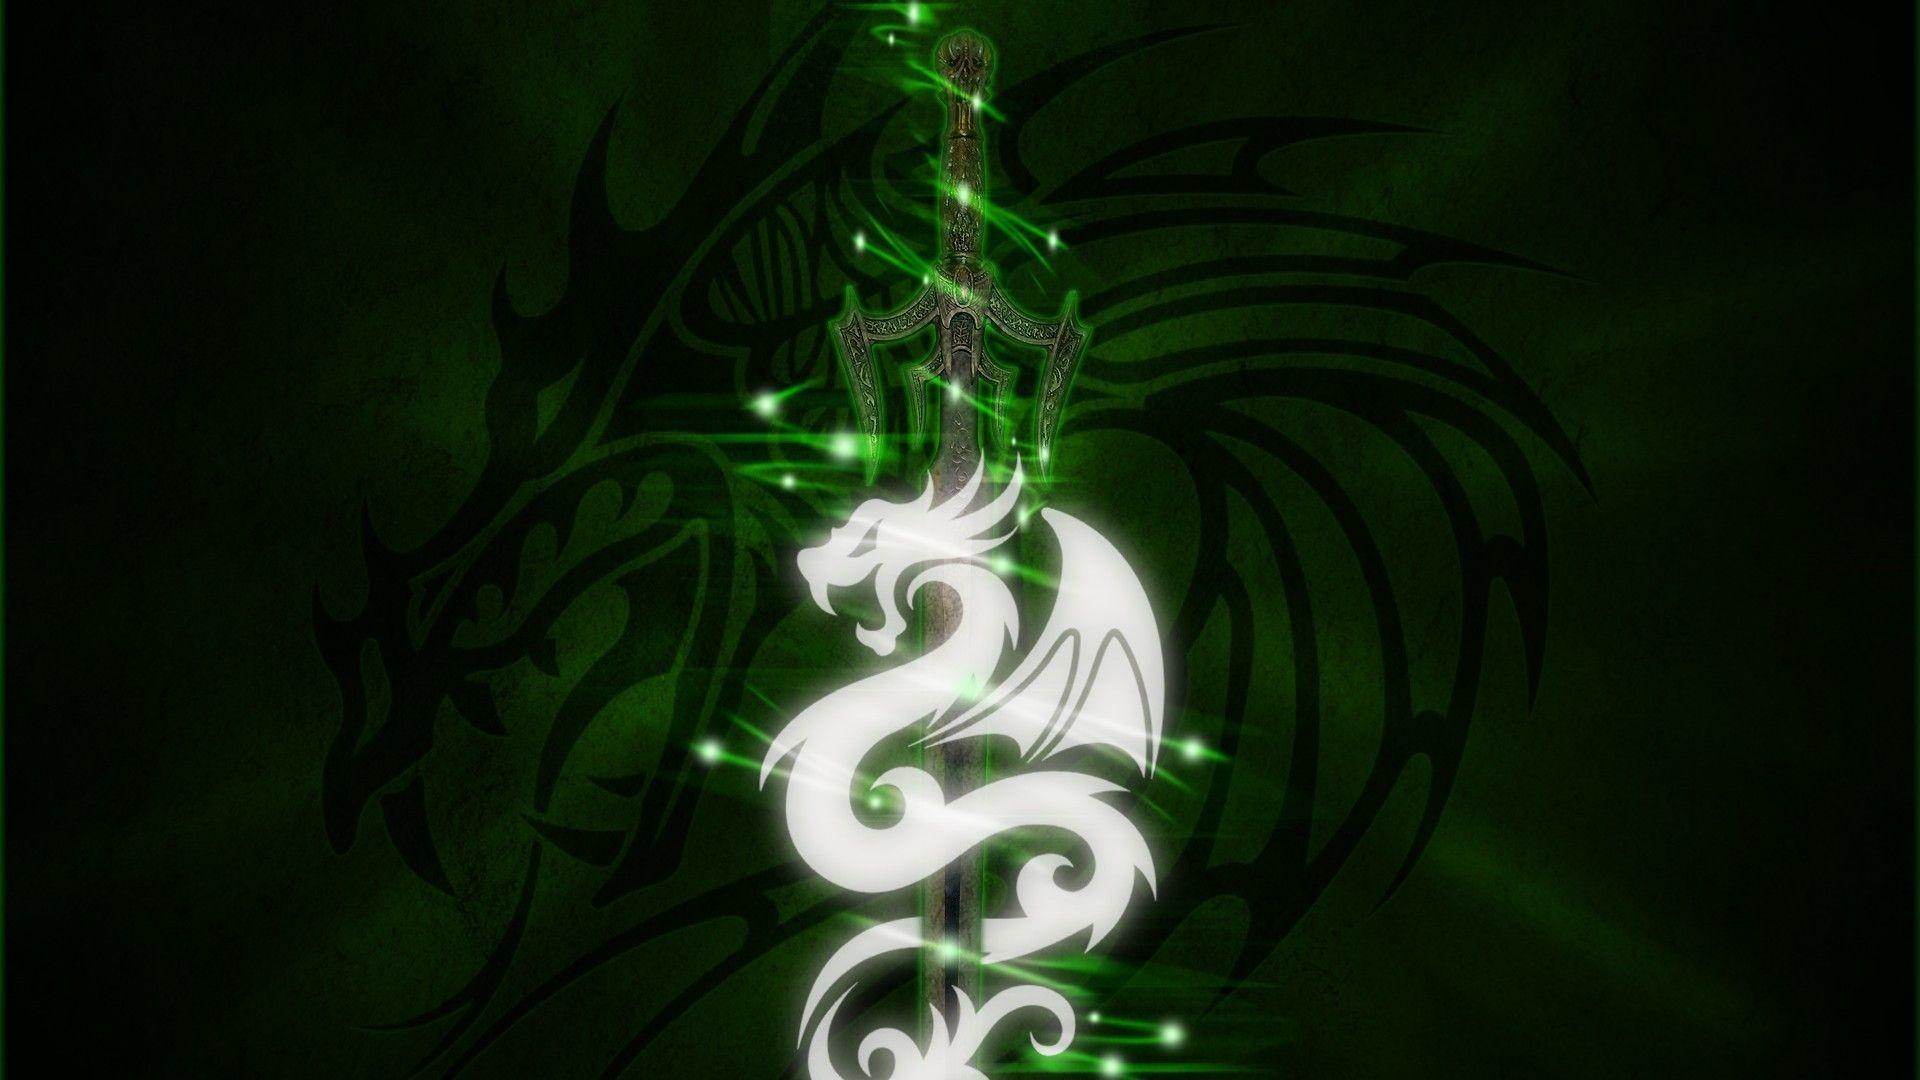 dragon wallpaper hd 183�� download free high resolution